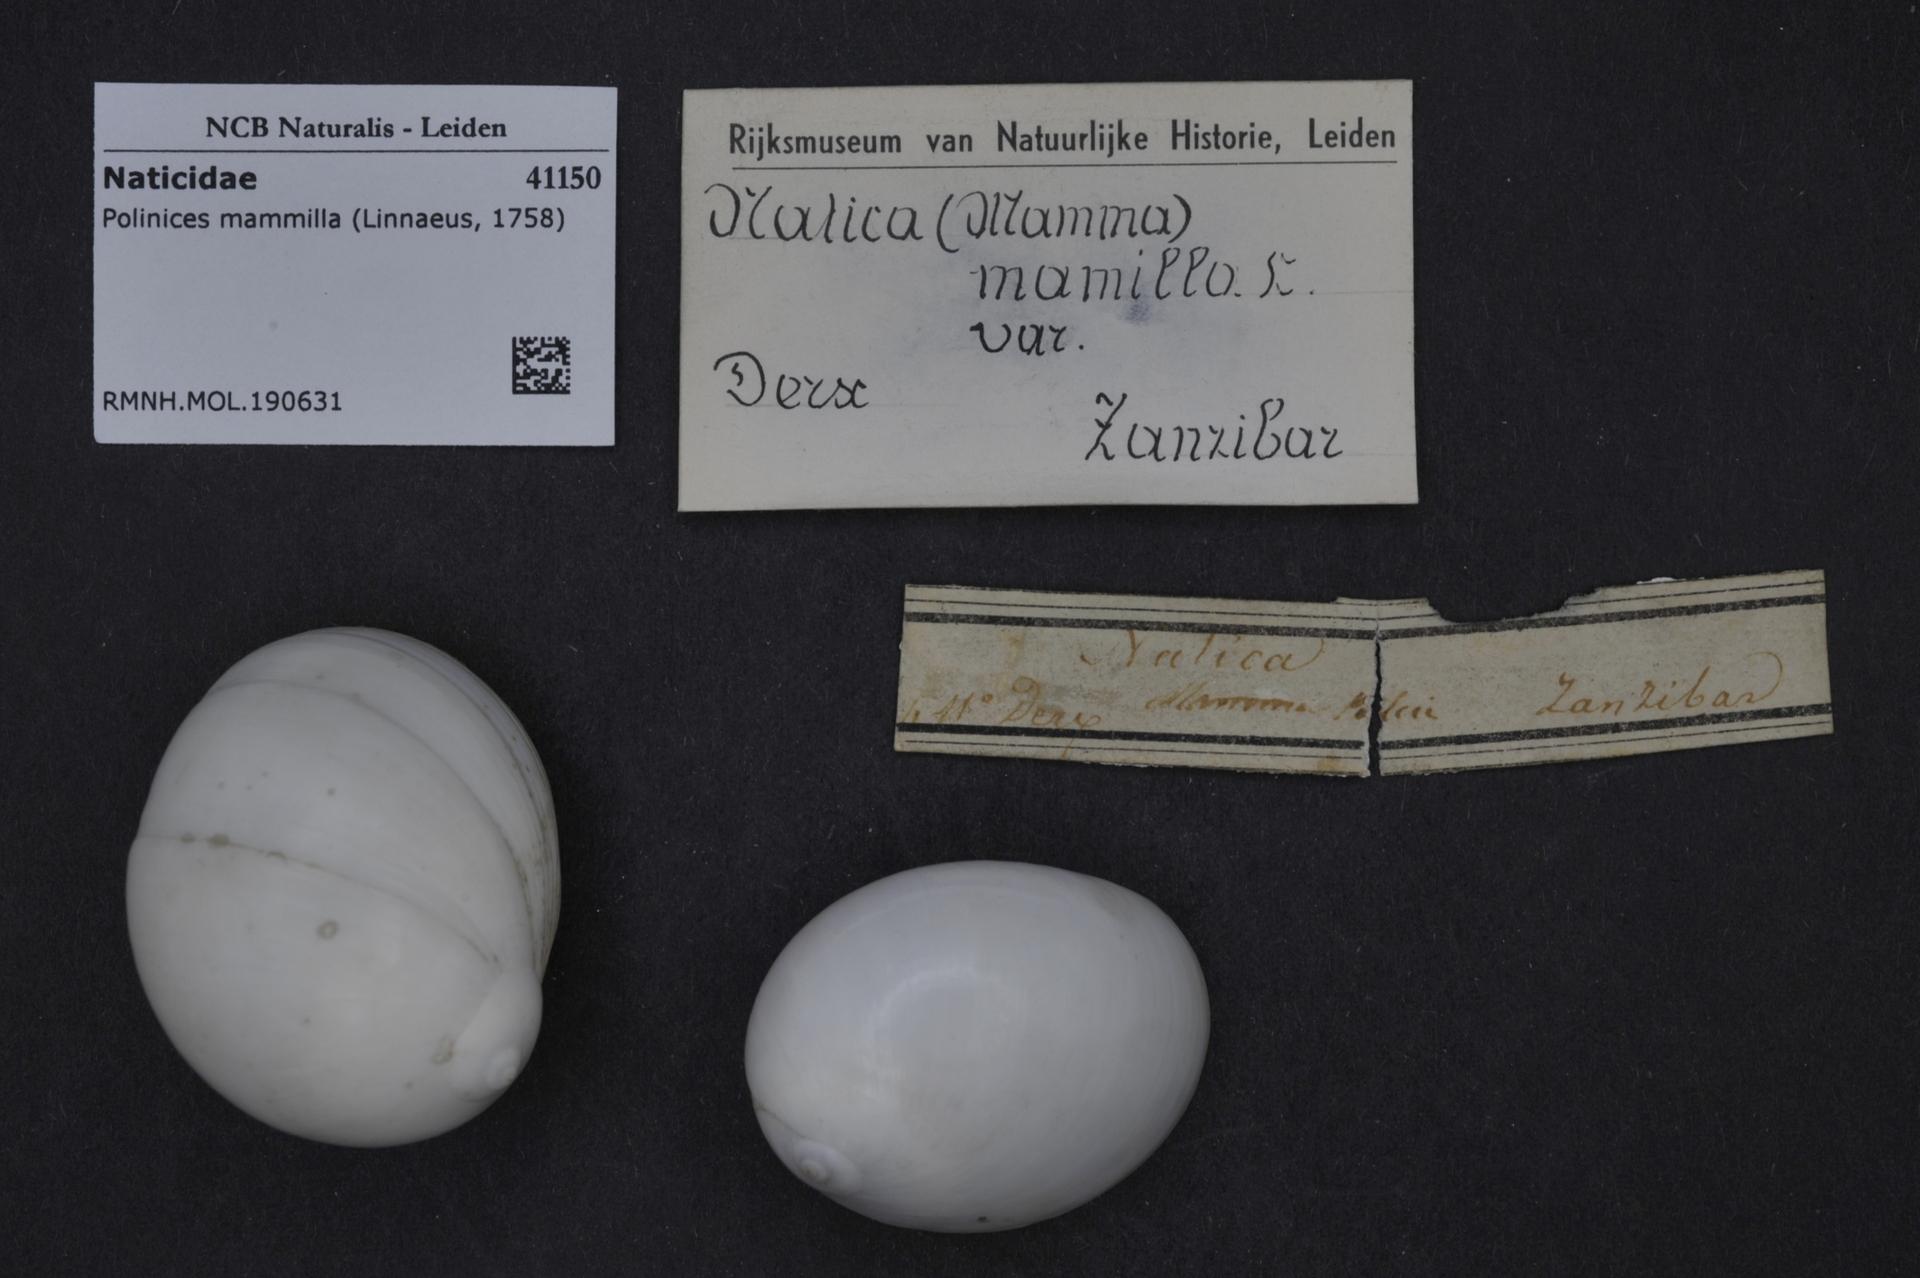 RMNH.MOL.190631 | Polinices mammilla (Linnaeus, 1758)